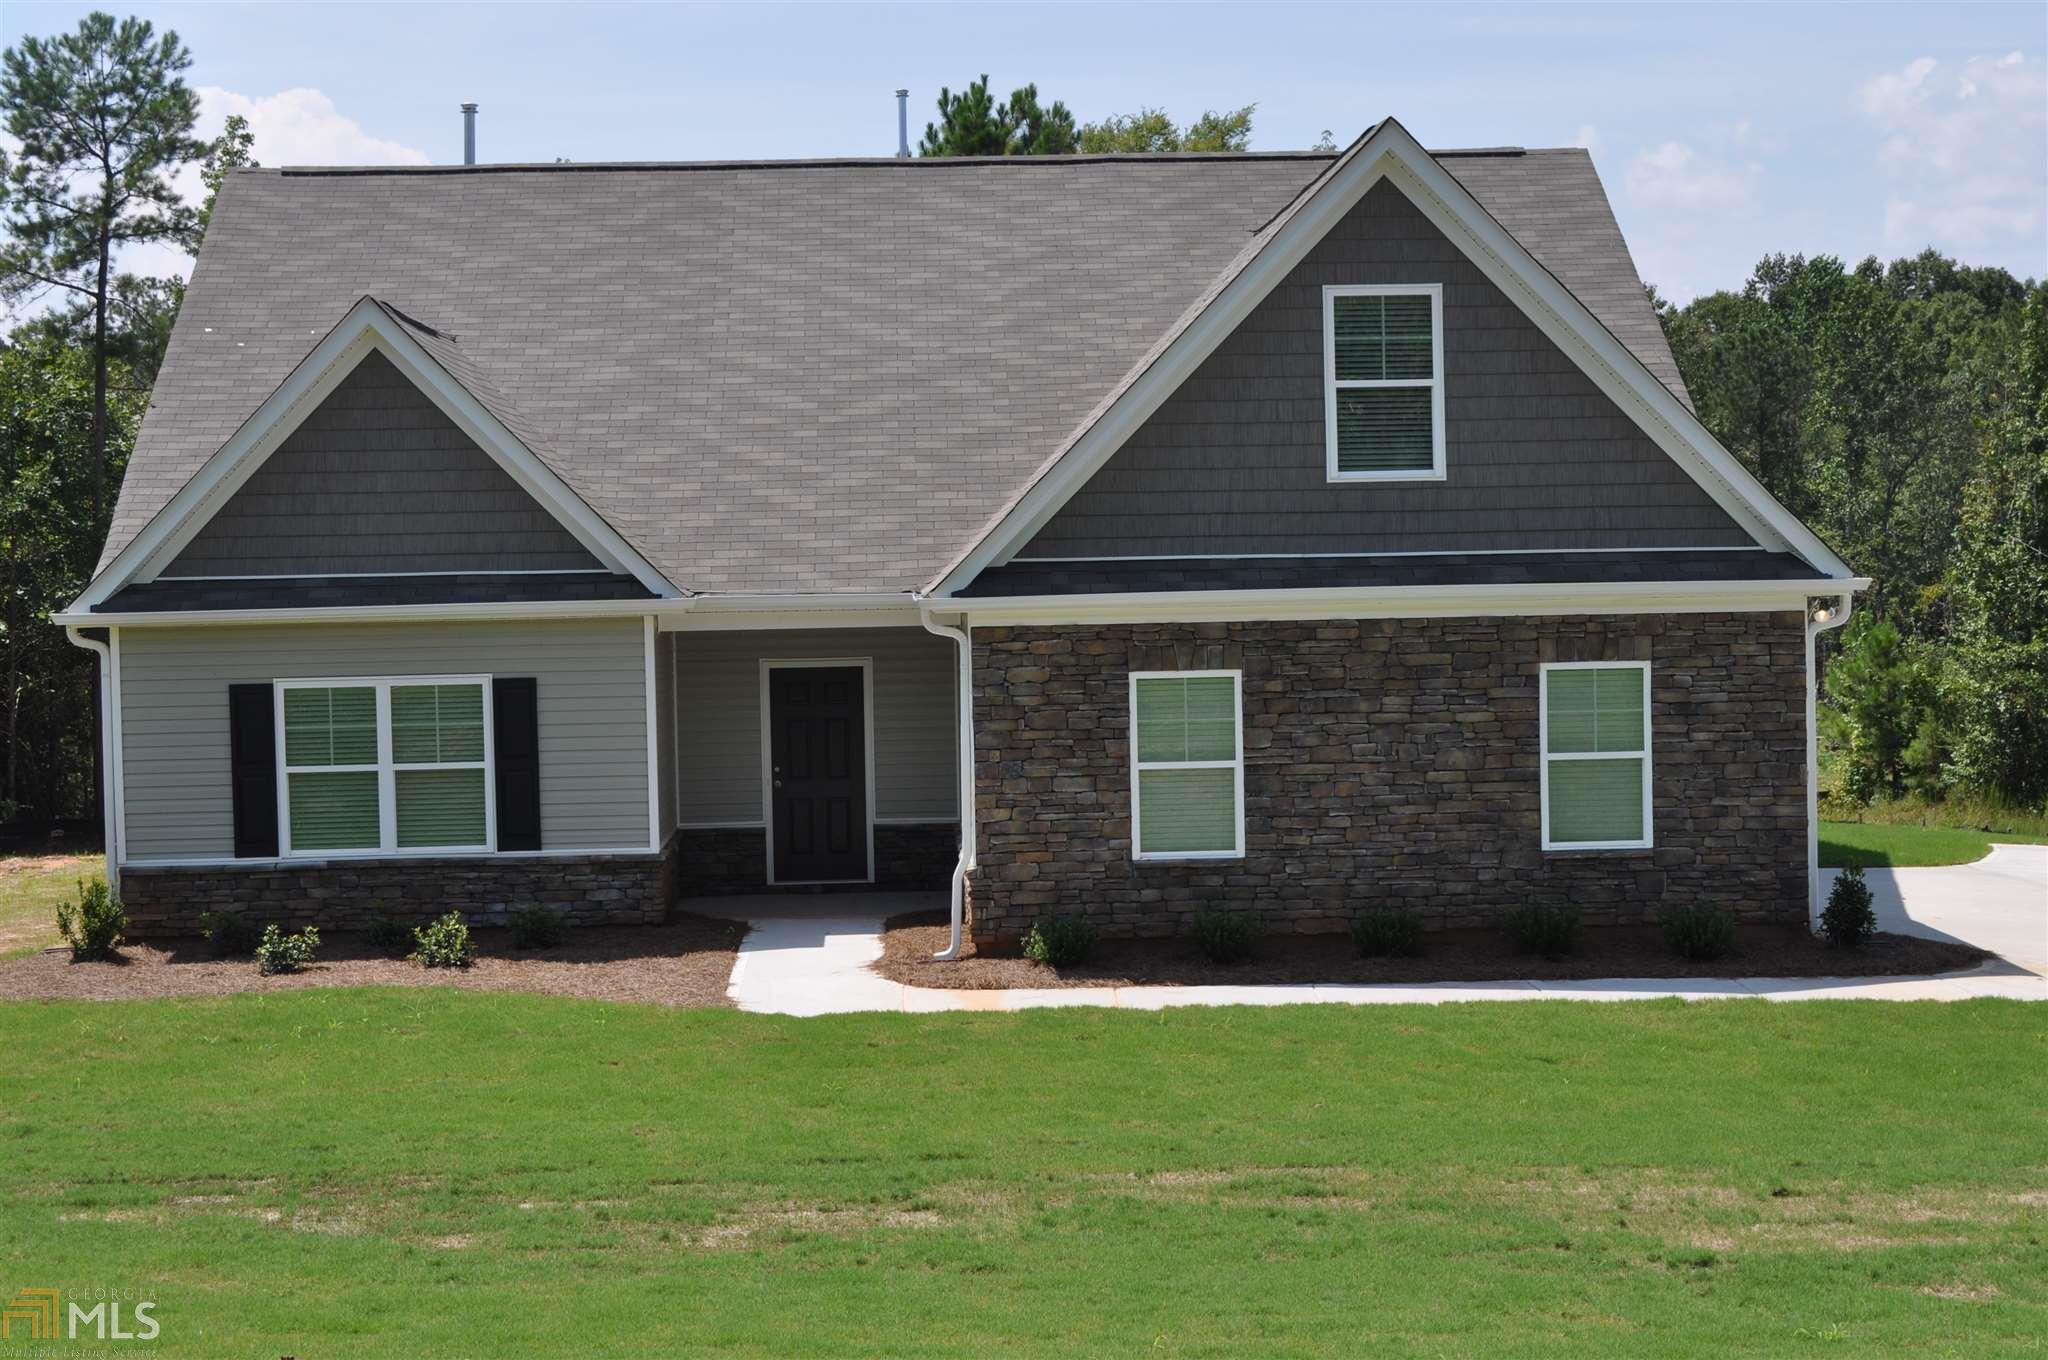 New Homes For Sale In Lagrange Ga